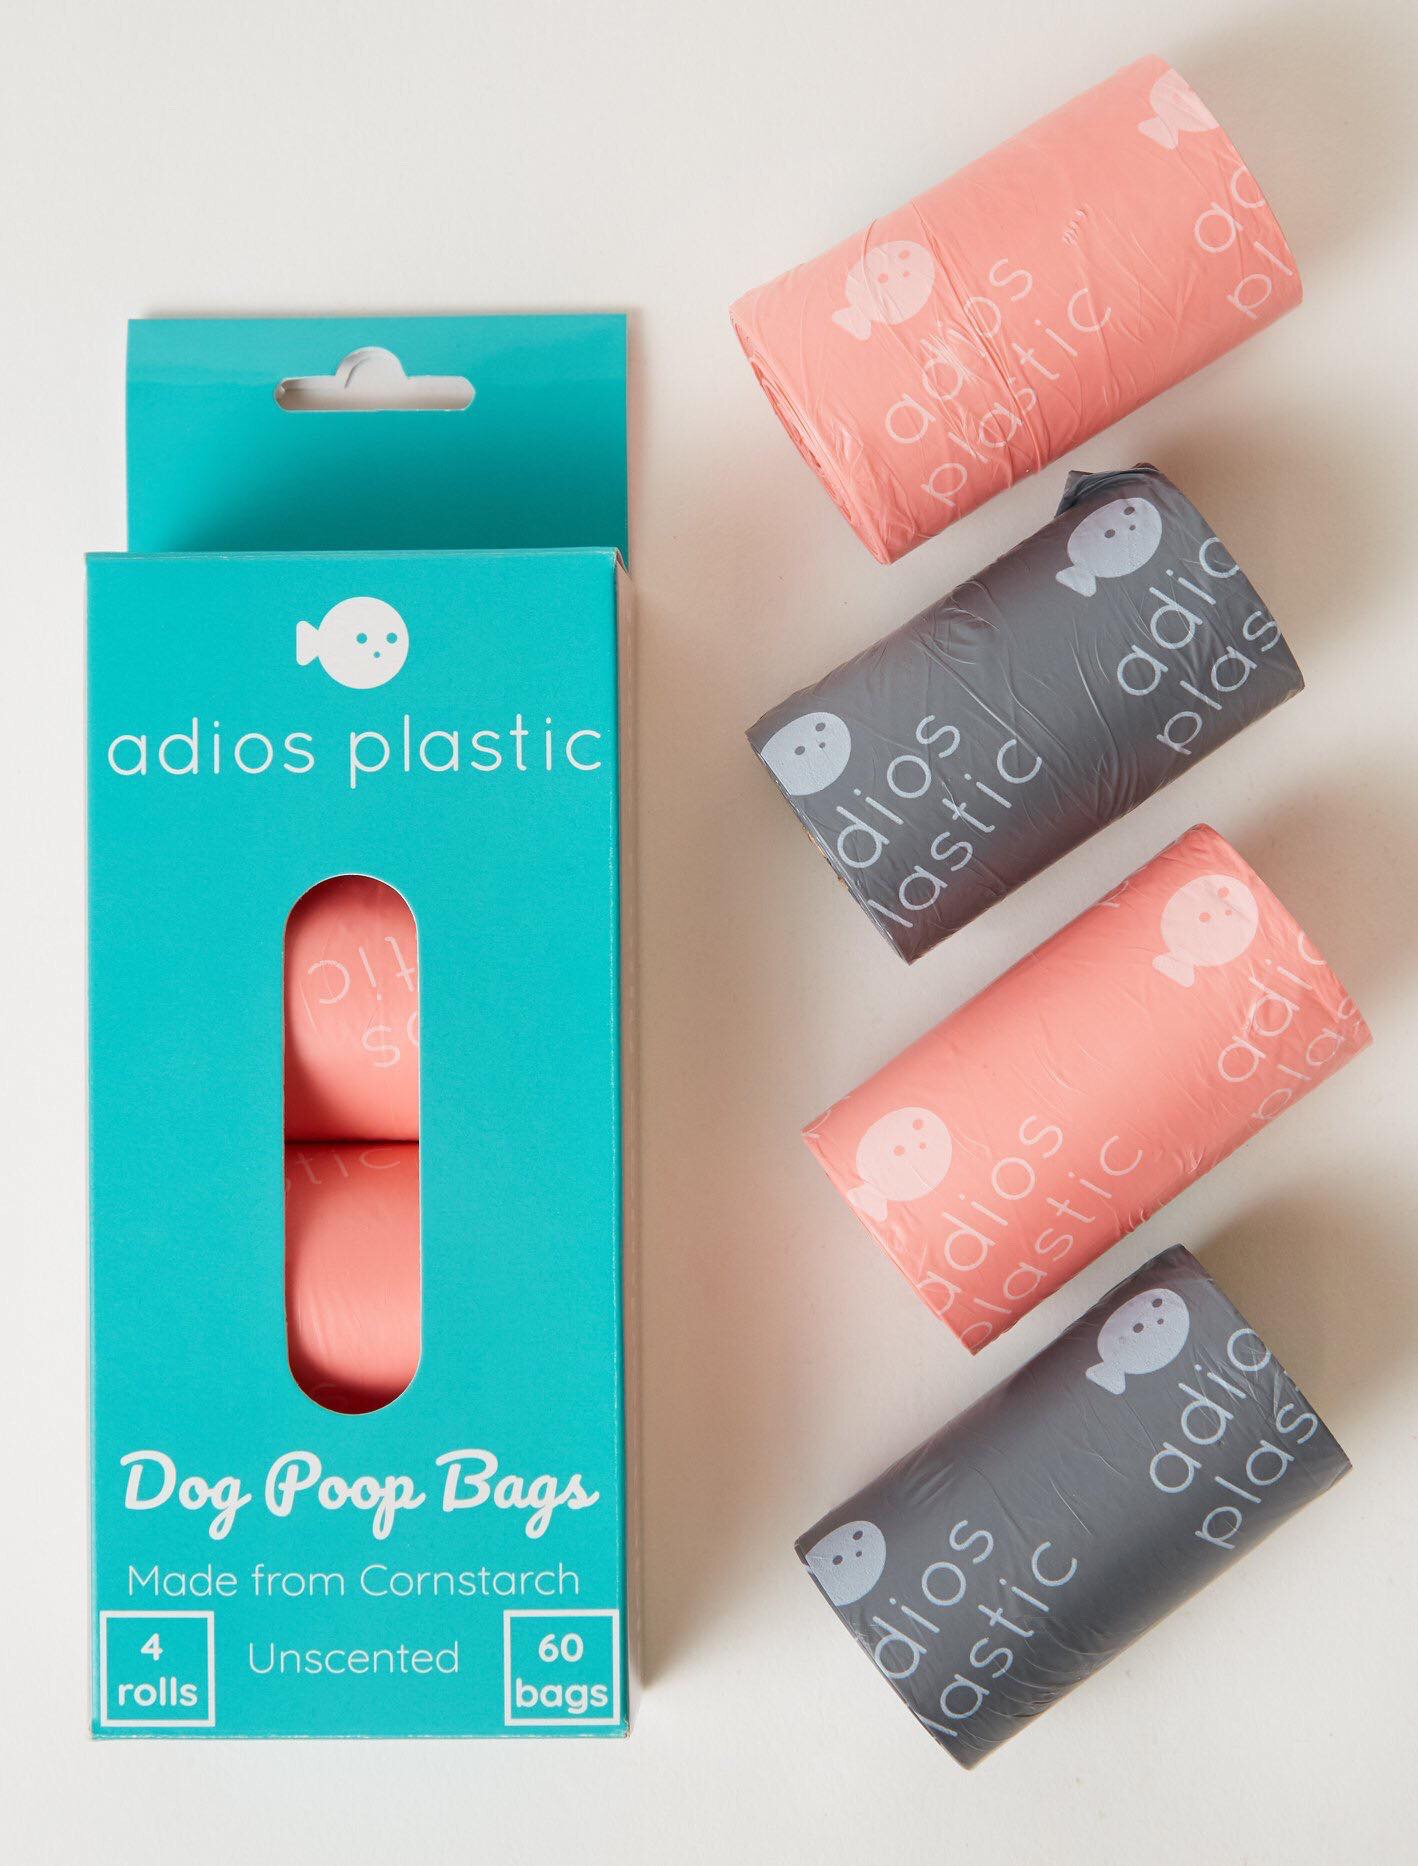 Adios Plastic Corn Starch dog poop bags Grey or Pink 60 bags